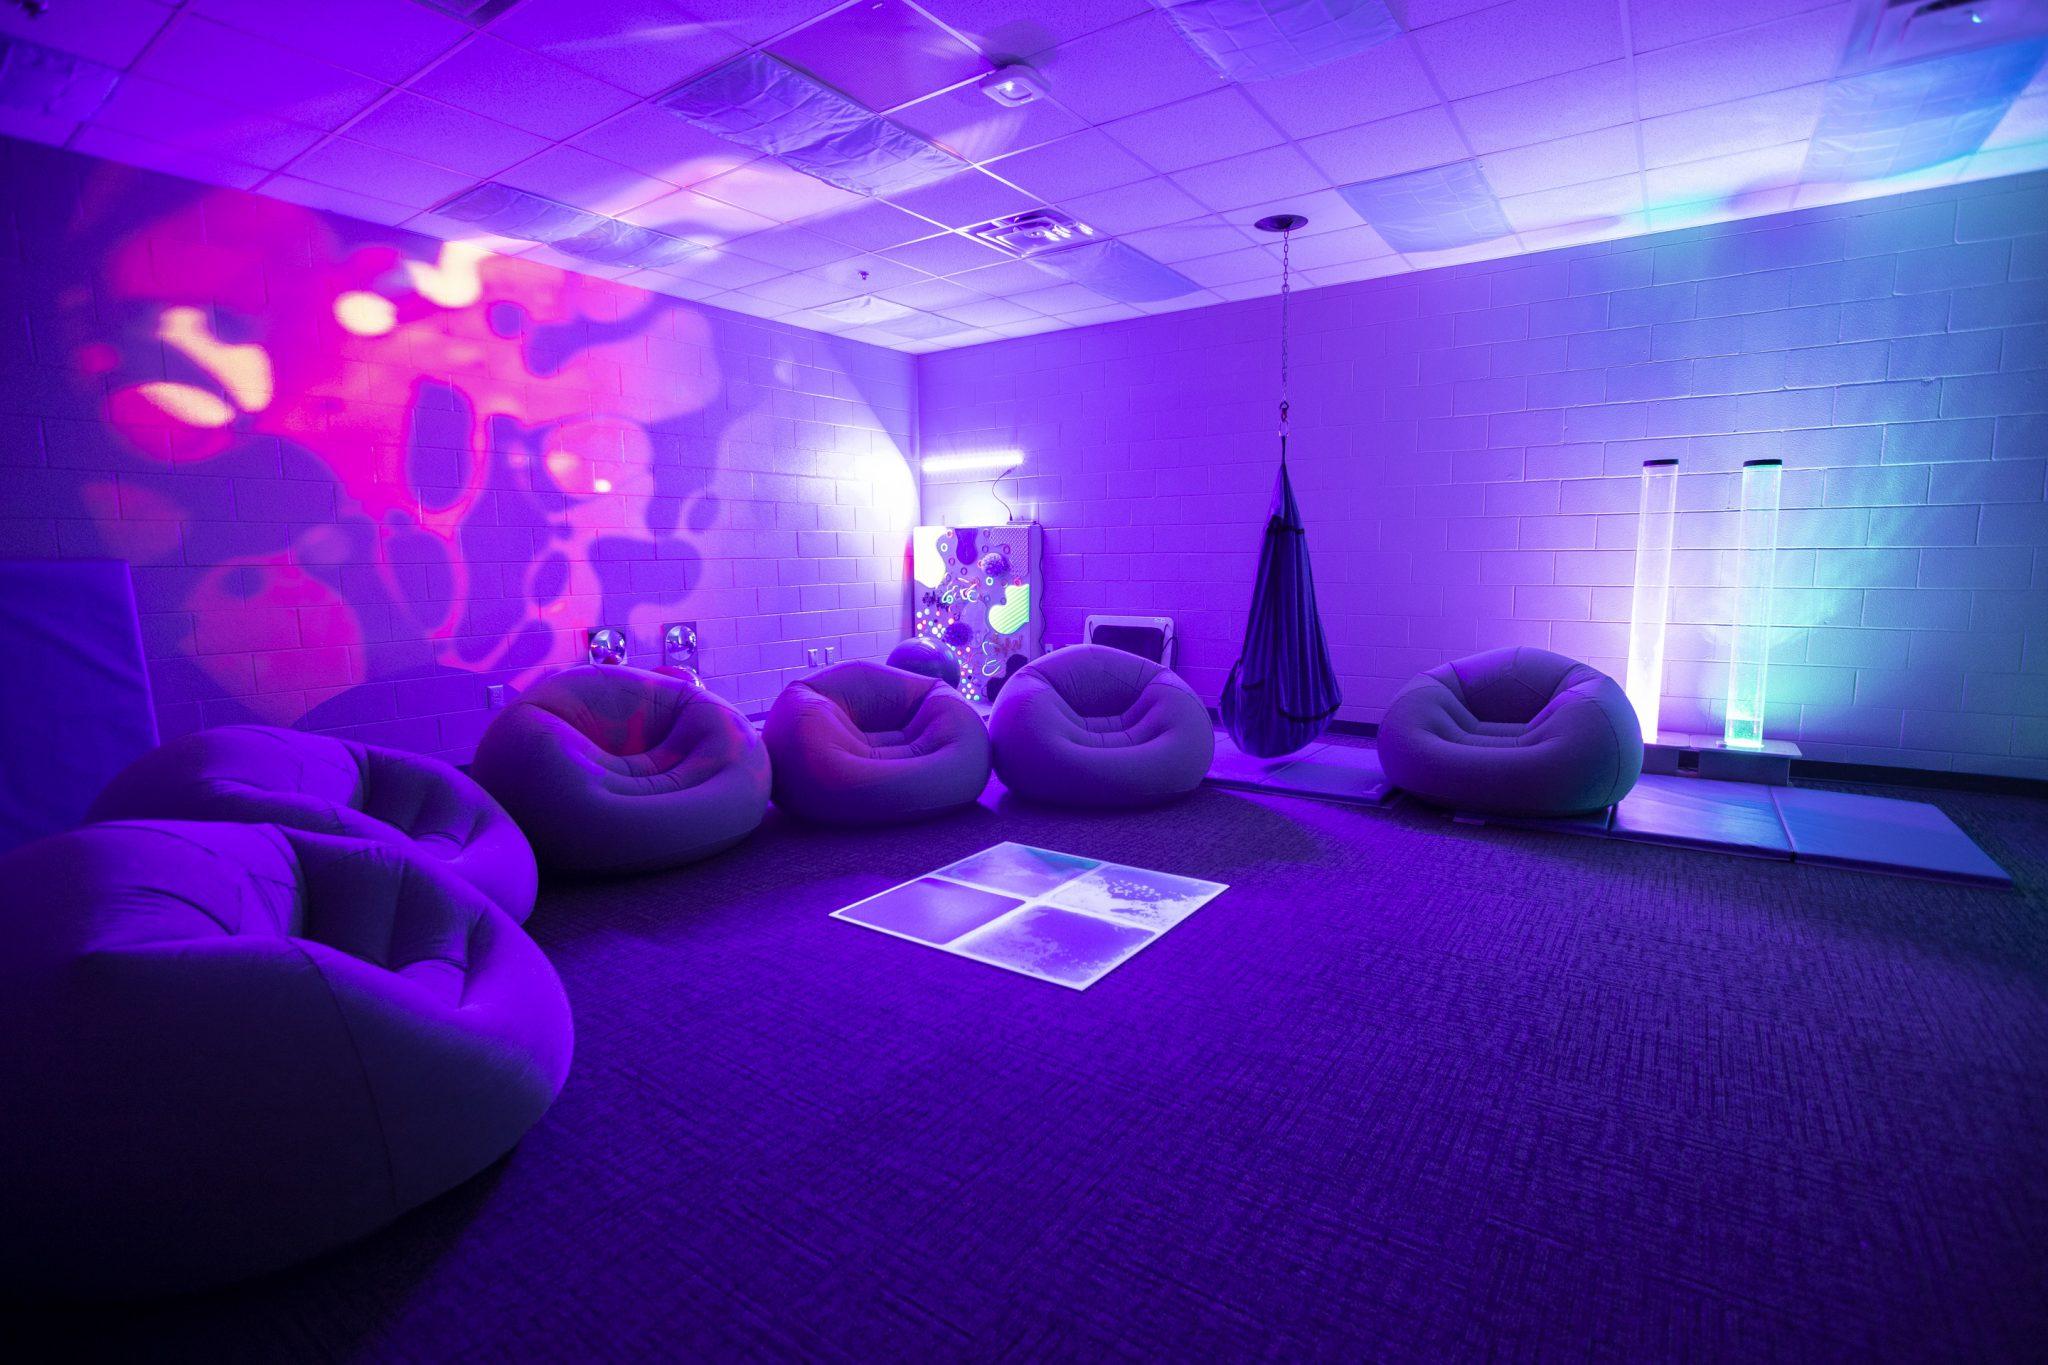 Commercial Carpet for School Sensory Rooms